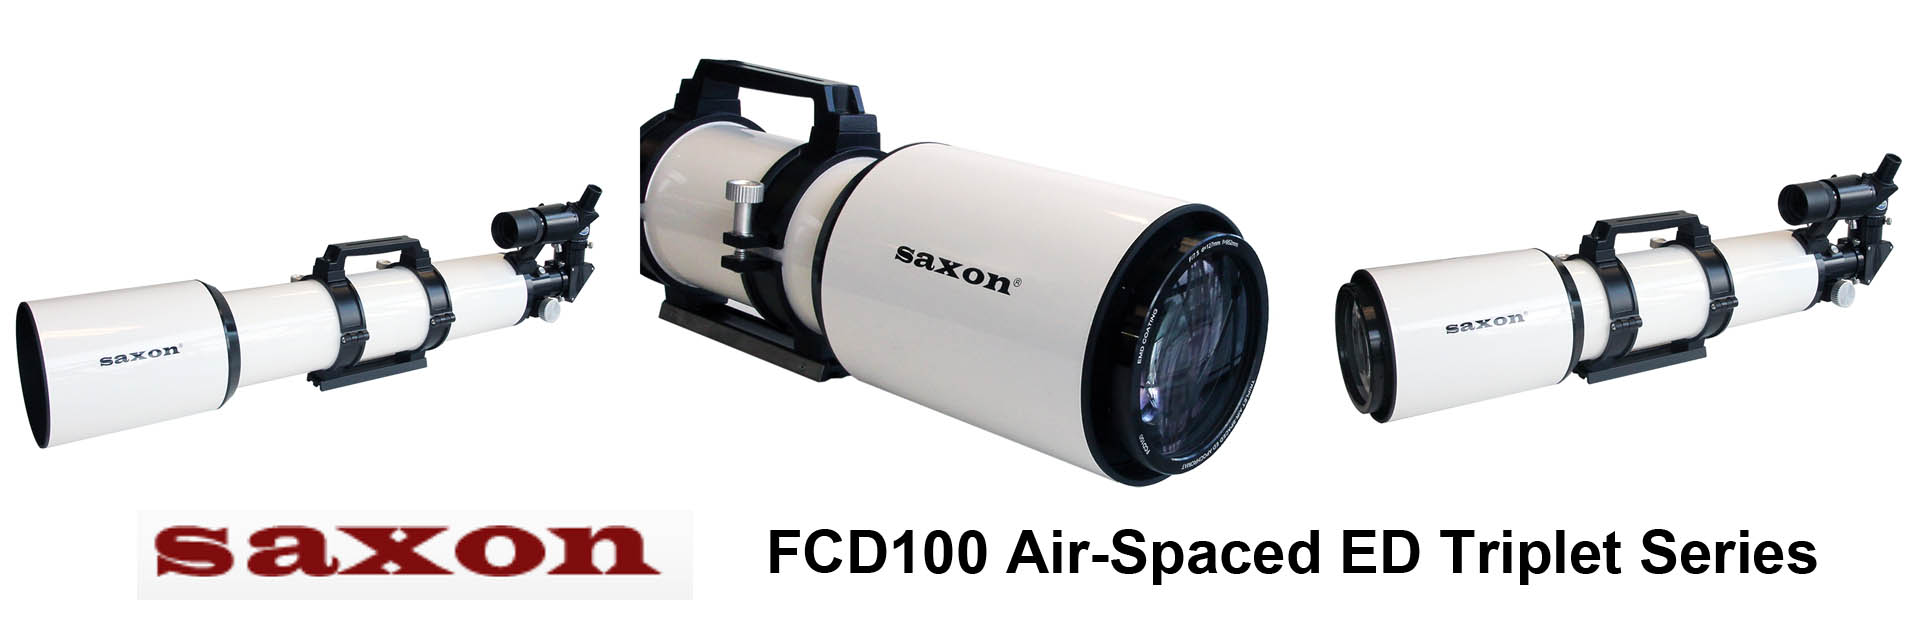 saxon FCD100 Series